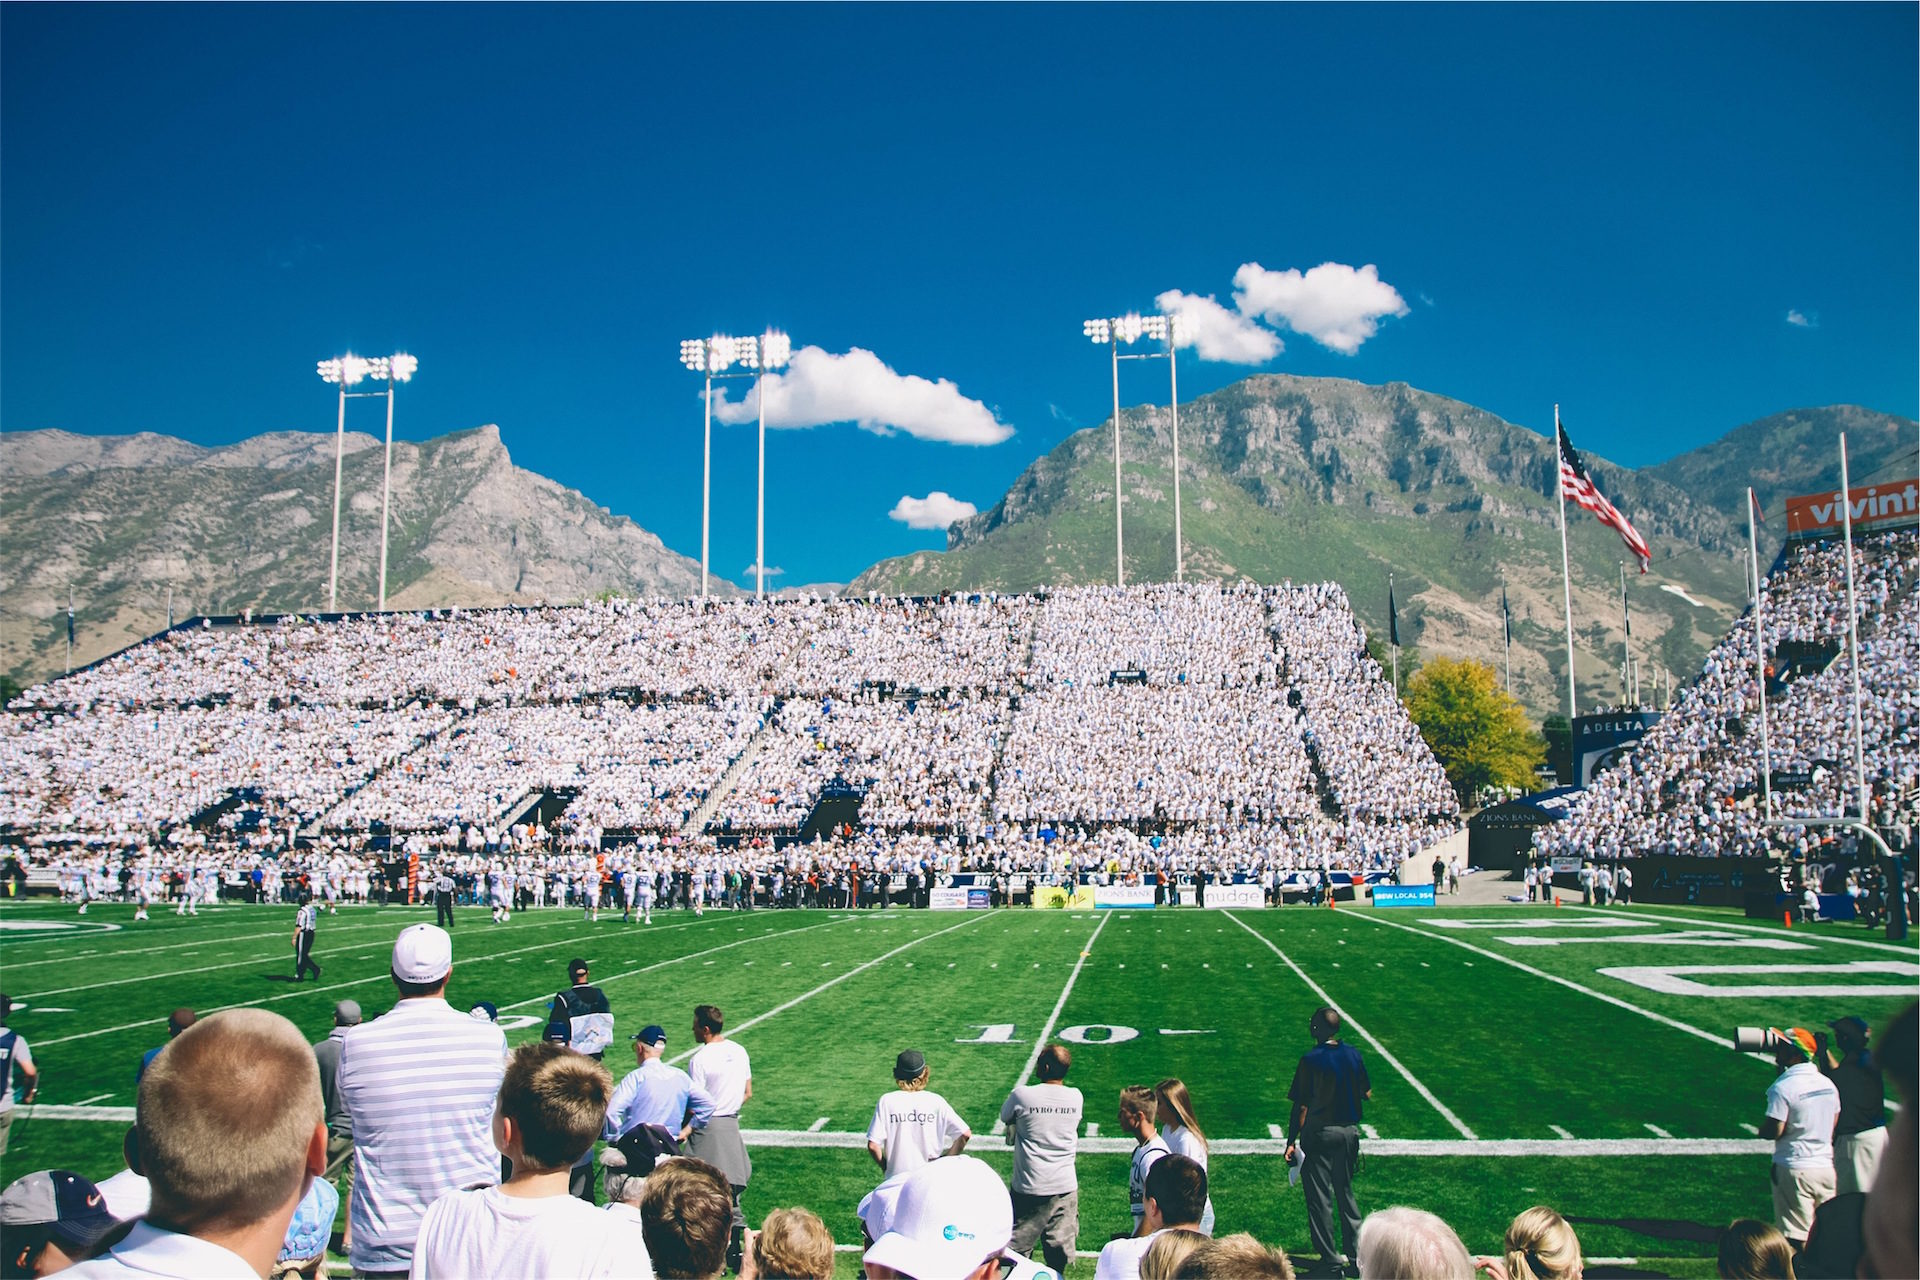 campo, Estádio, Rugby, passatempo, concorrência - Papéis de parede HD - Professor-falken.com